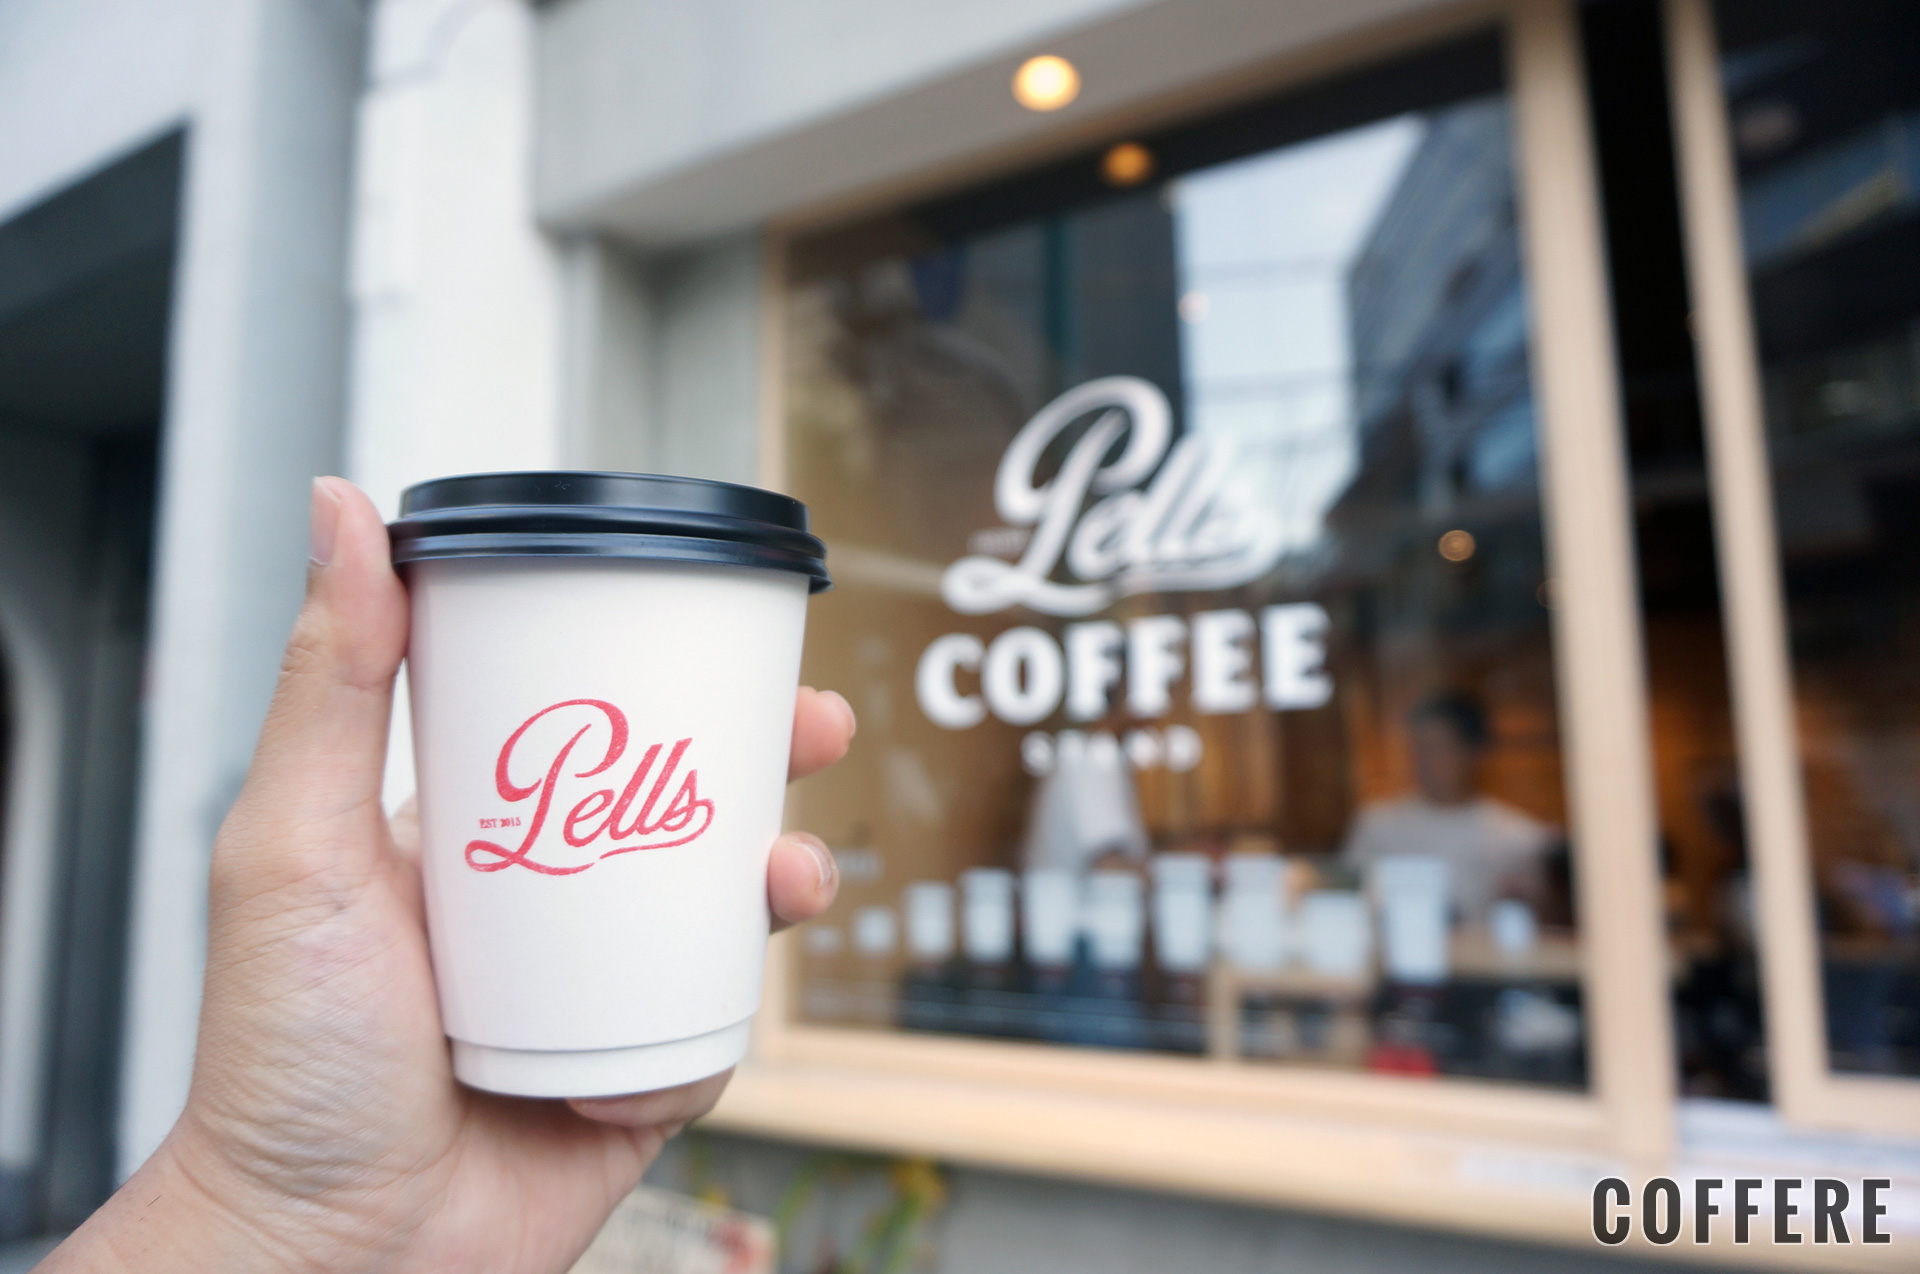 PELLS COFFEE STANDのテイクアウトカップとカウンター